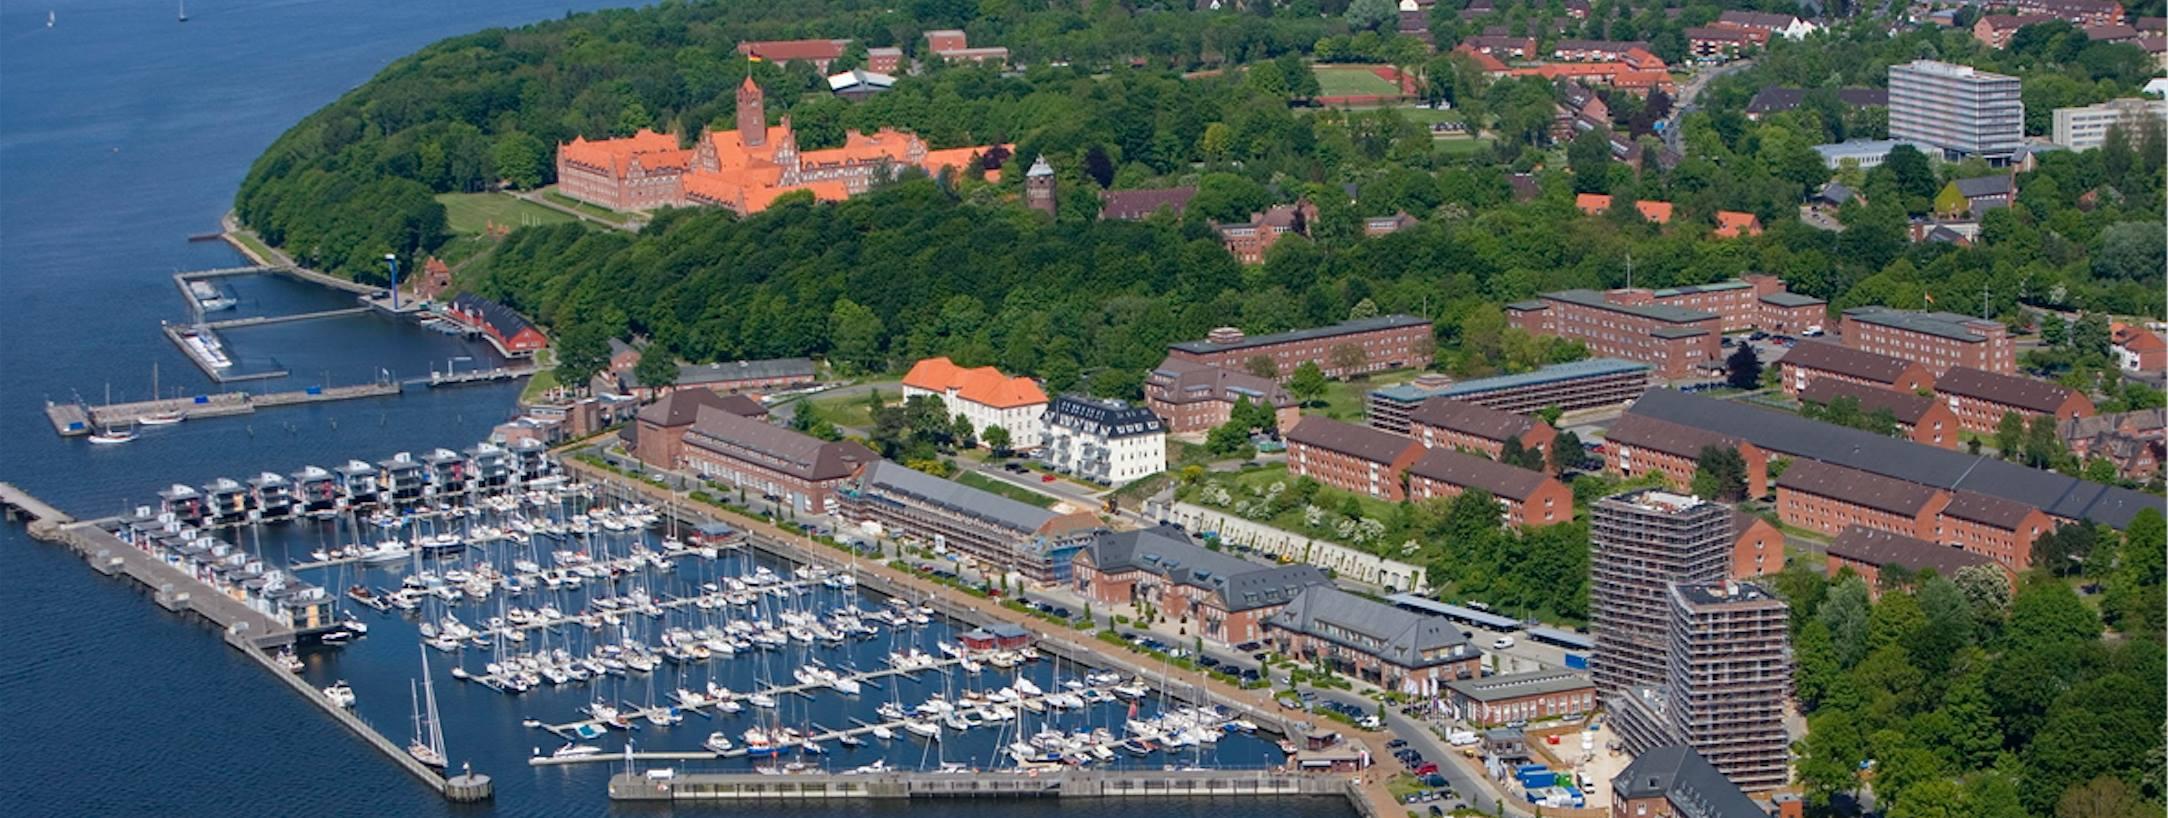 Bootsmesse Flensburg